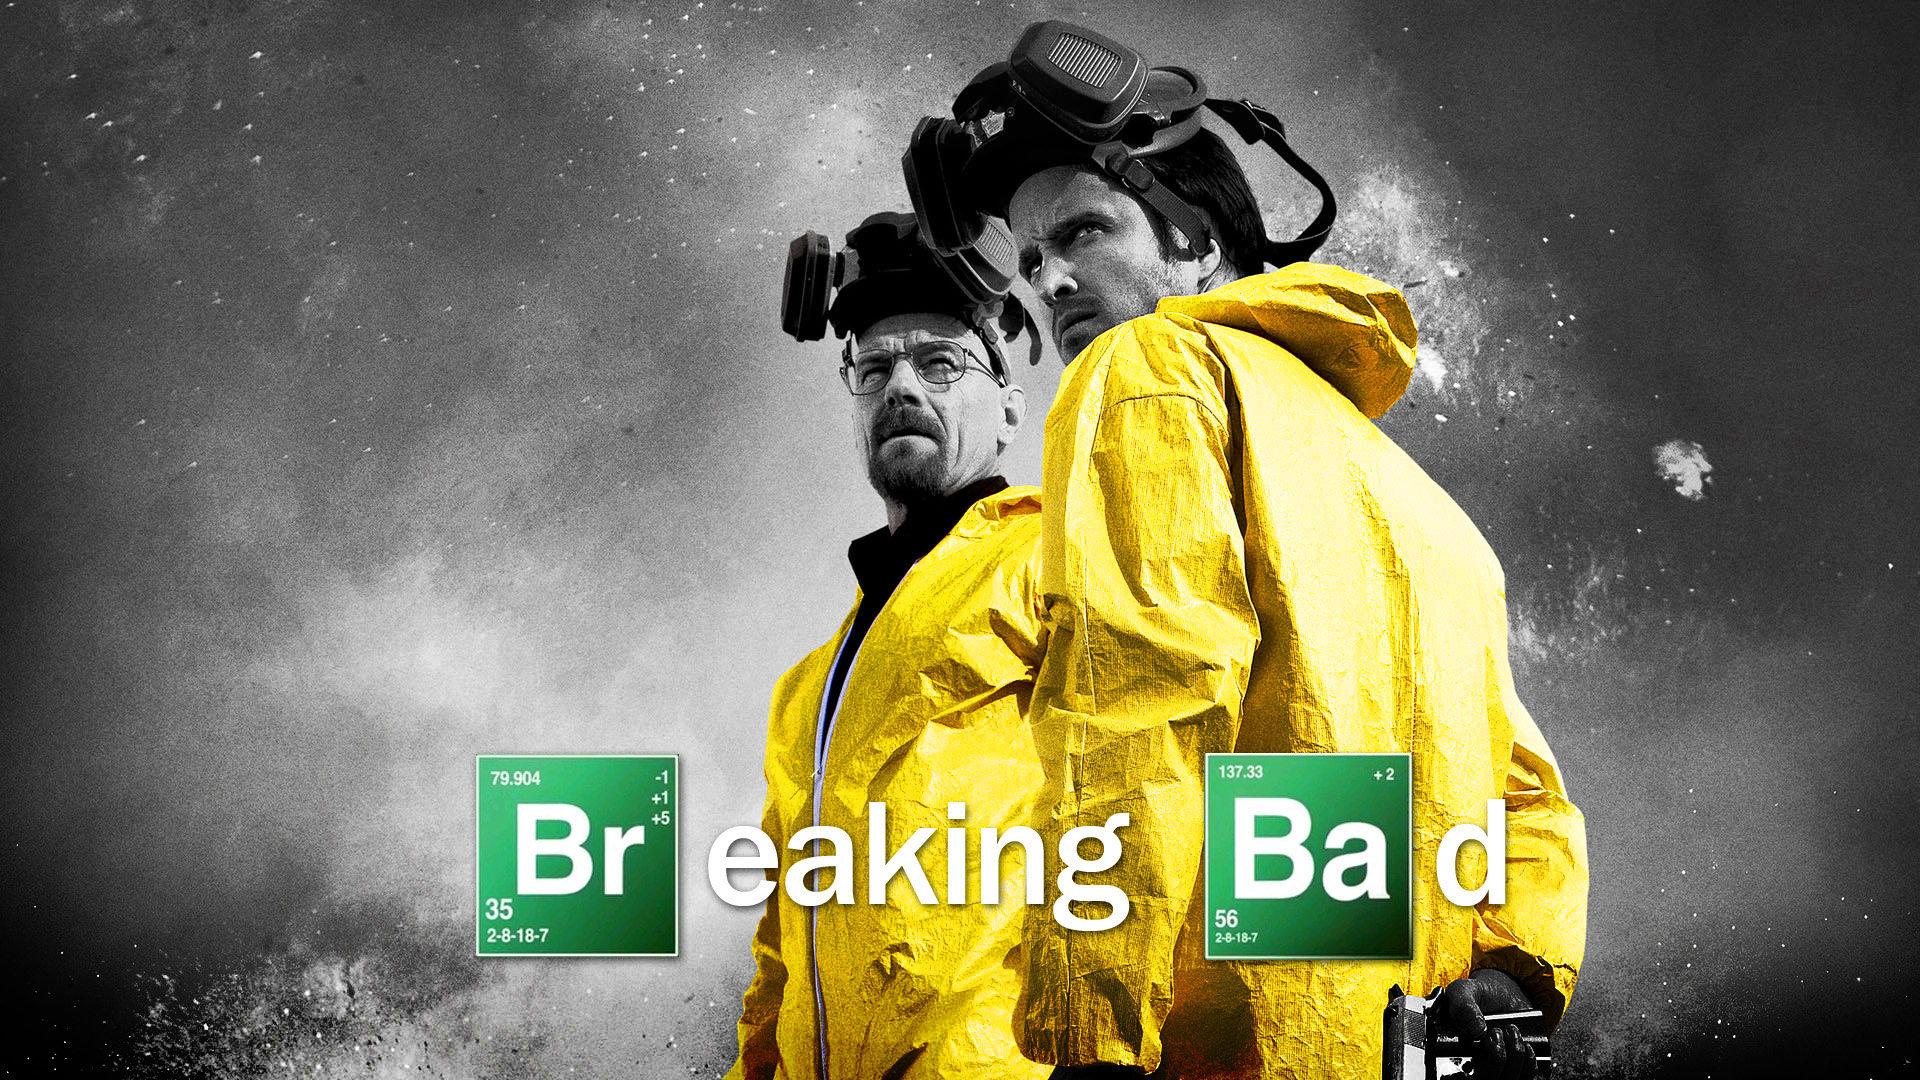 Breaking Bad Background Wallpaper 19201080 21538 HD Wallpaper Res 1920x1080